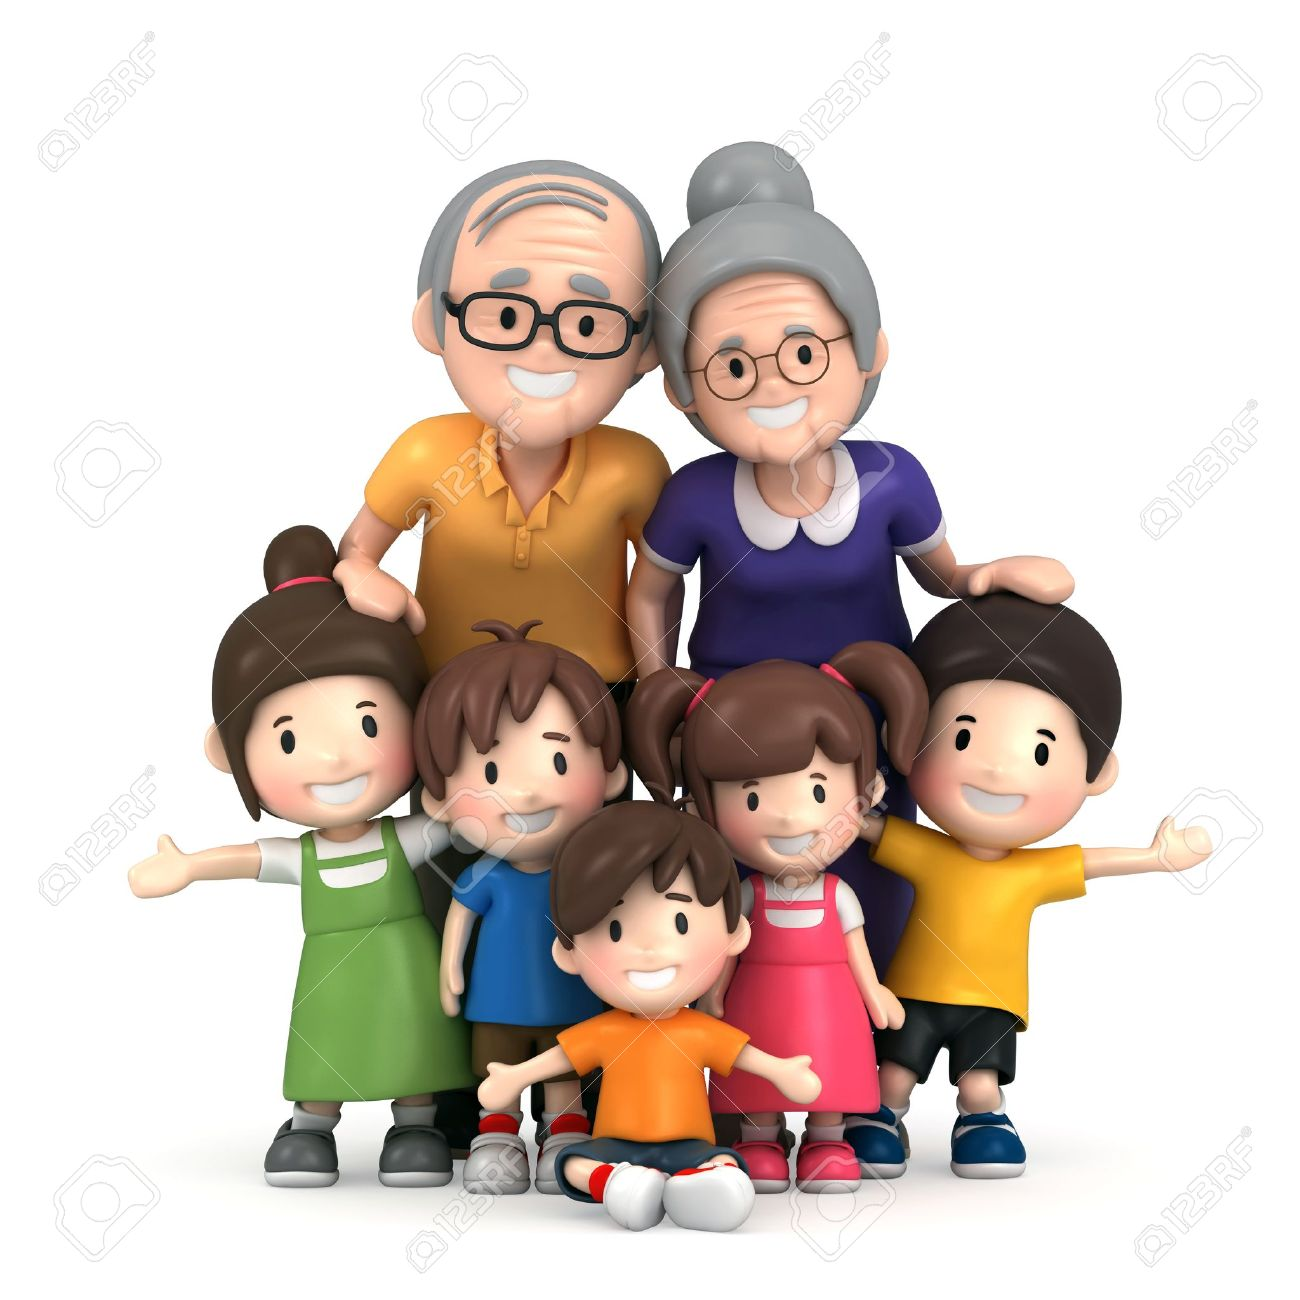 Grandparents with grandchildren clipart svg royalty free stock Grandparents with grandchildren clipart 9 » Clipart Station svg royalty free stock